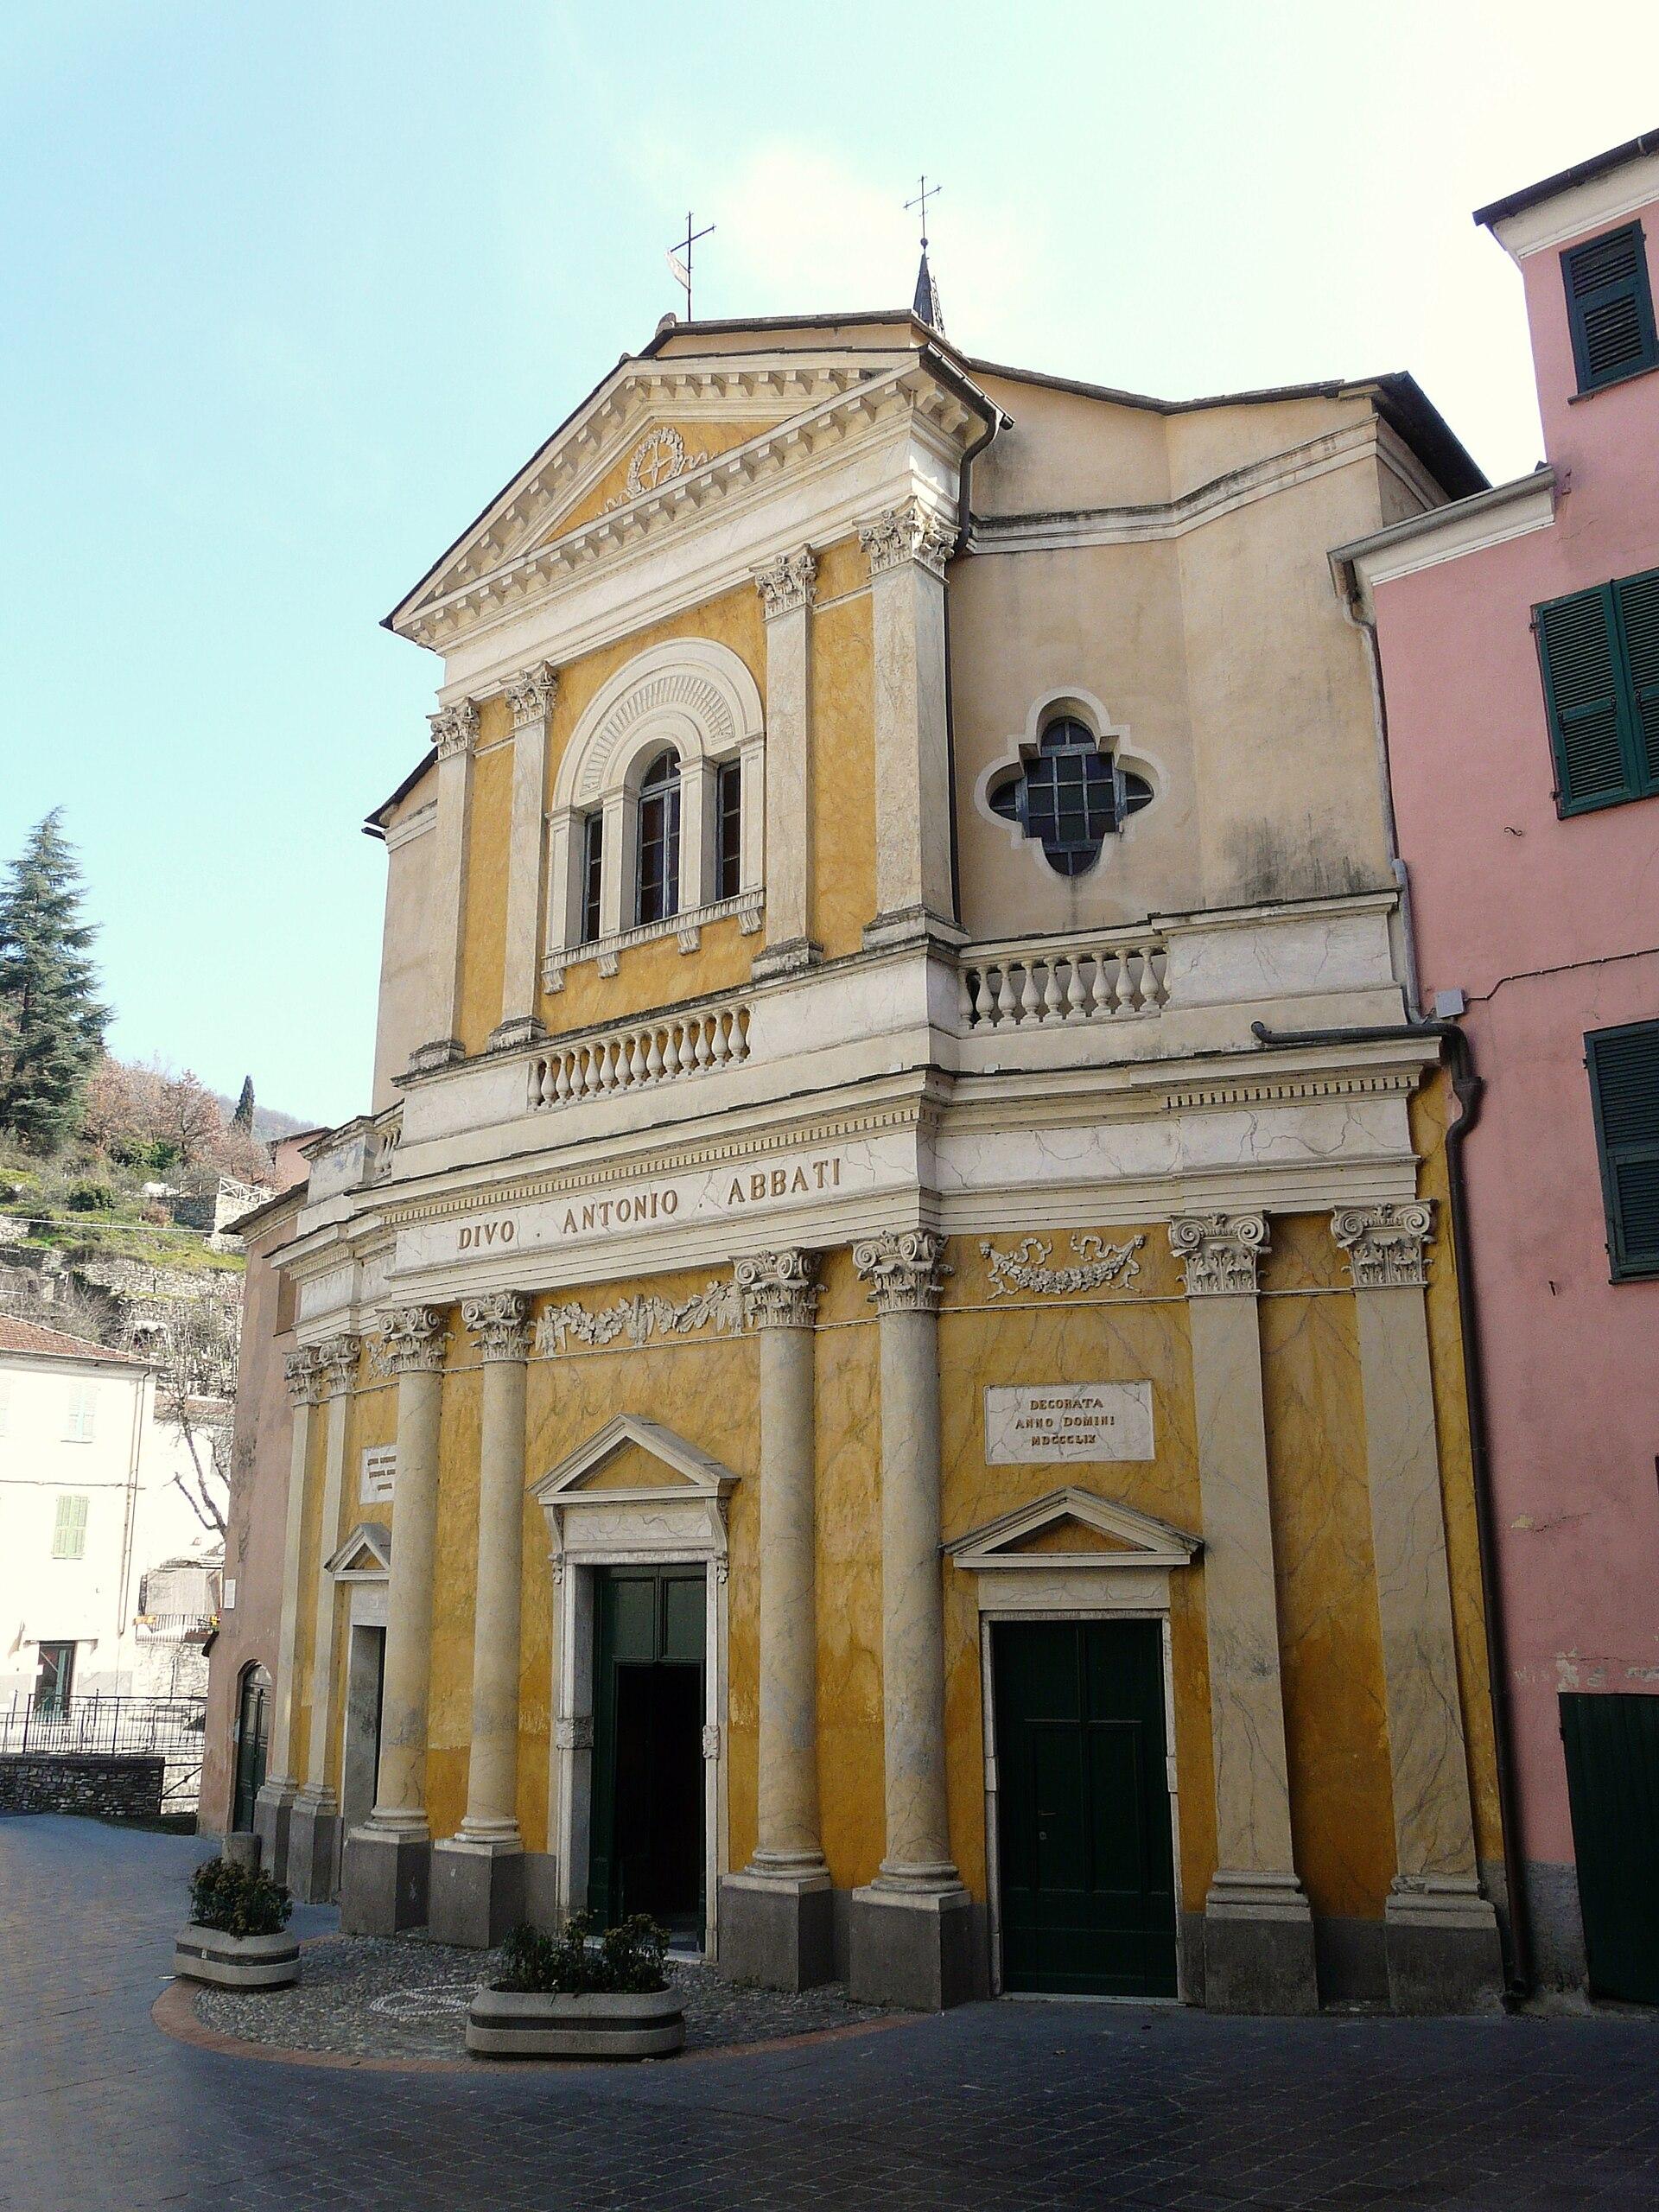 Chiesa di sant 39 antonio abate borgomaro wikipedia for Arredo bimbo sant antonio abate